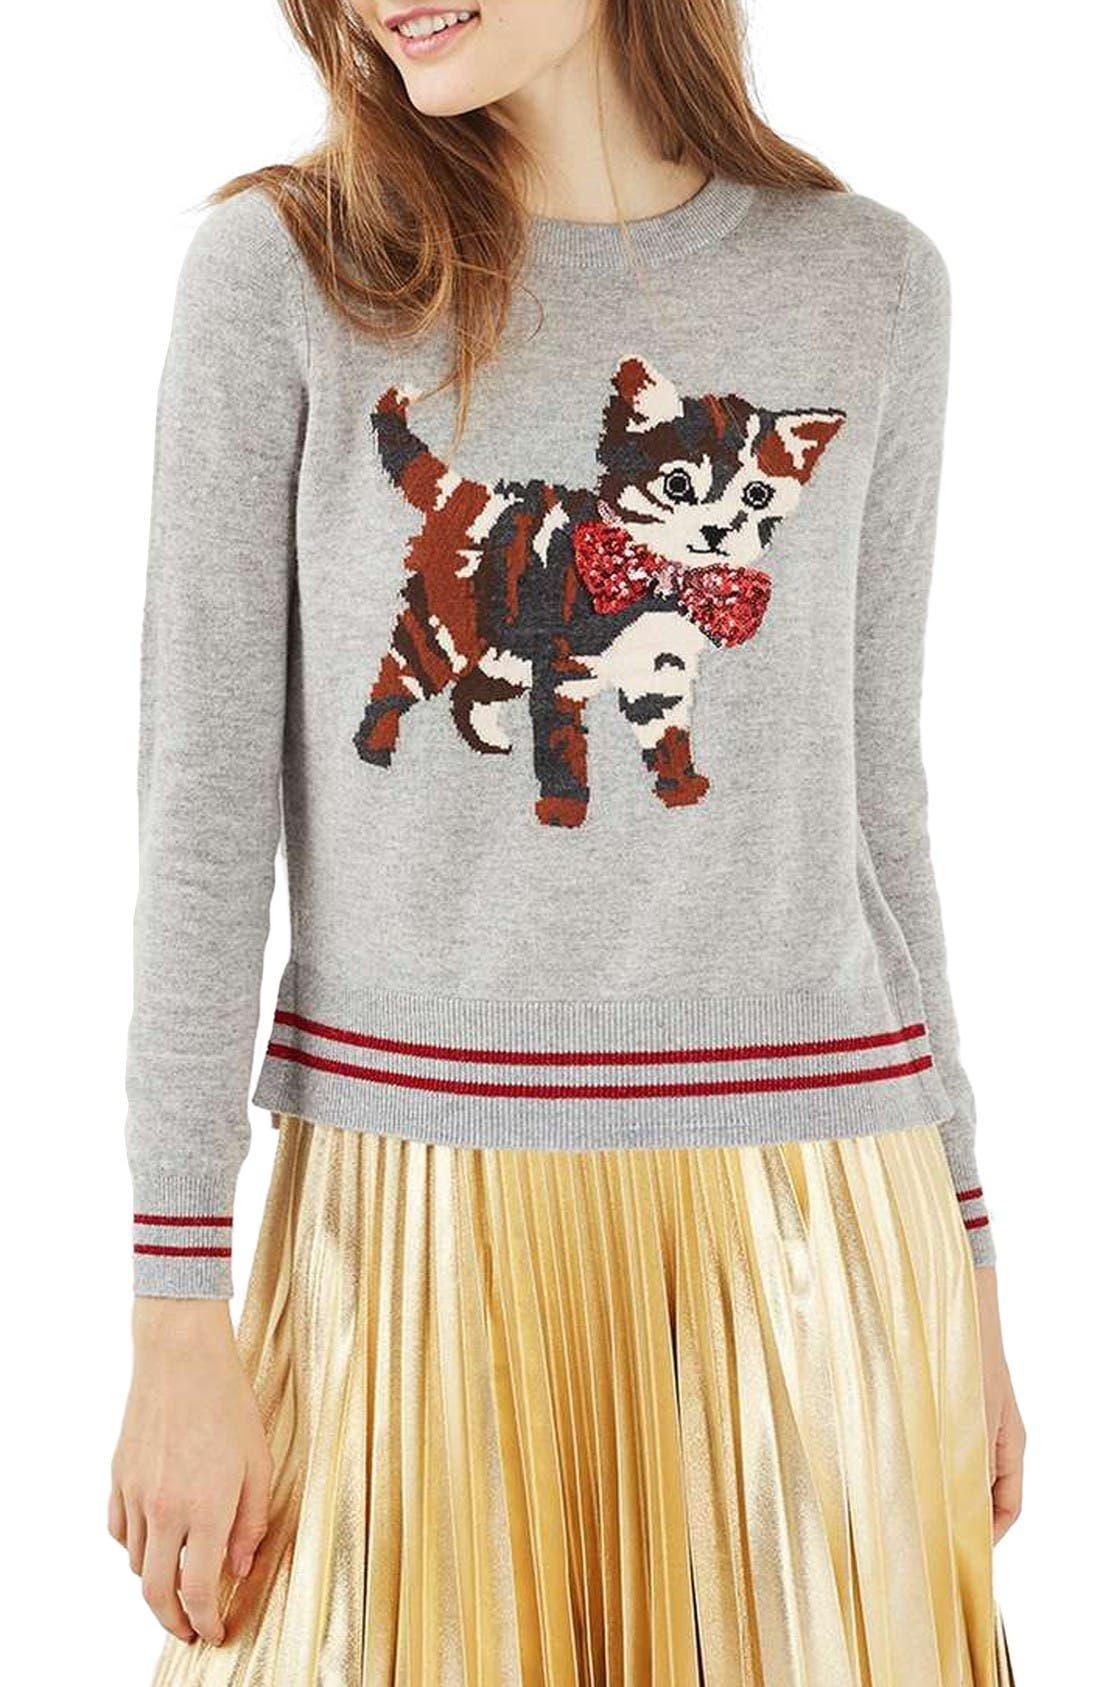 Main Image - Topshop Sequin Embellished Cat Sweater (Petite)